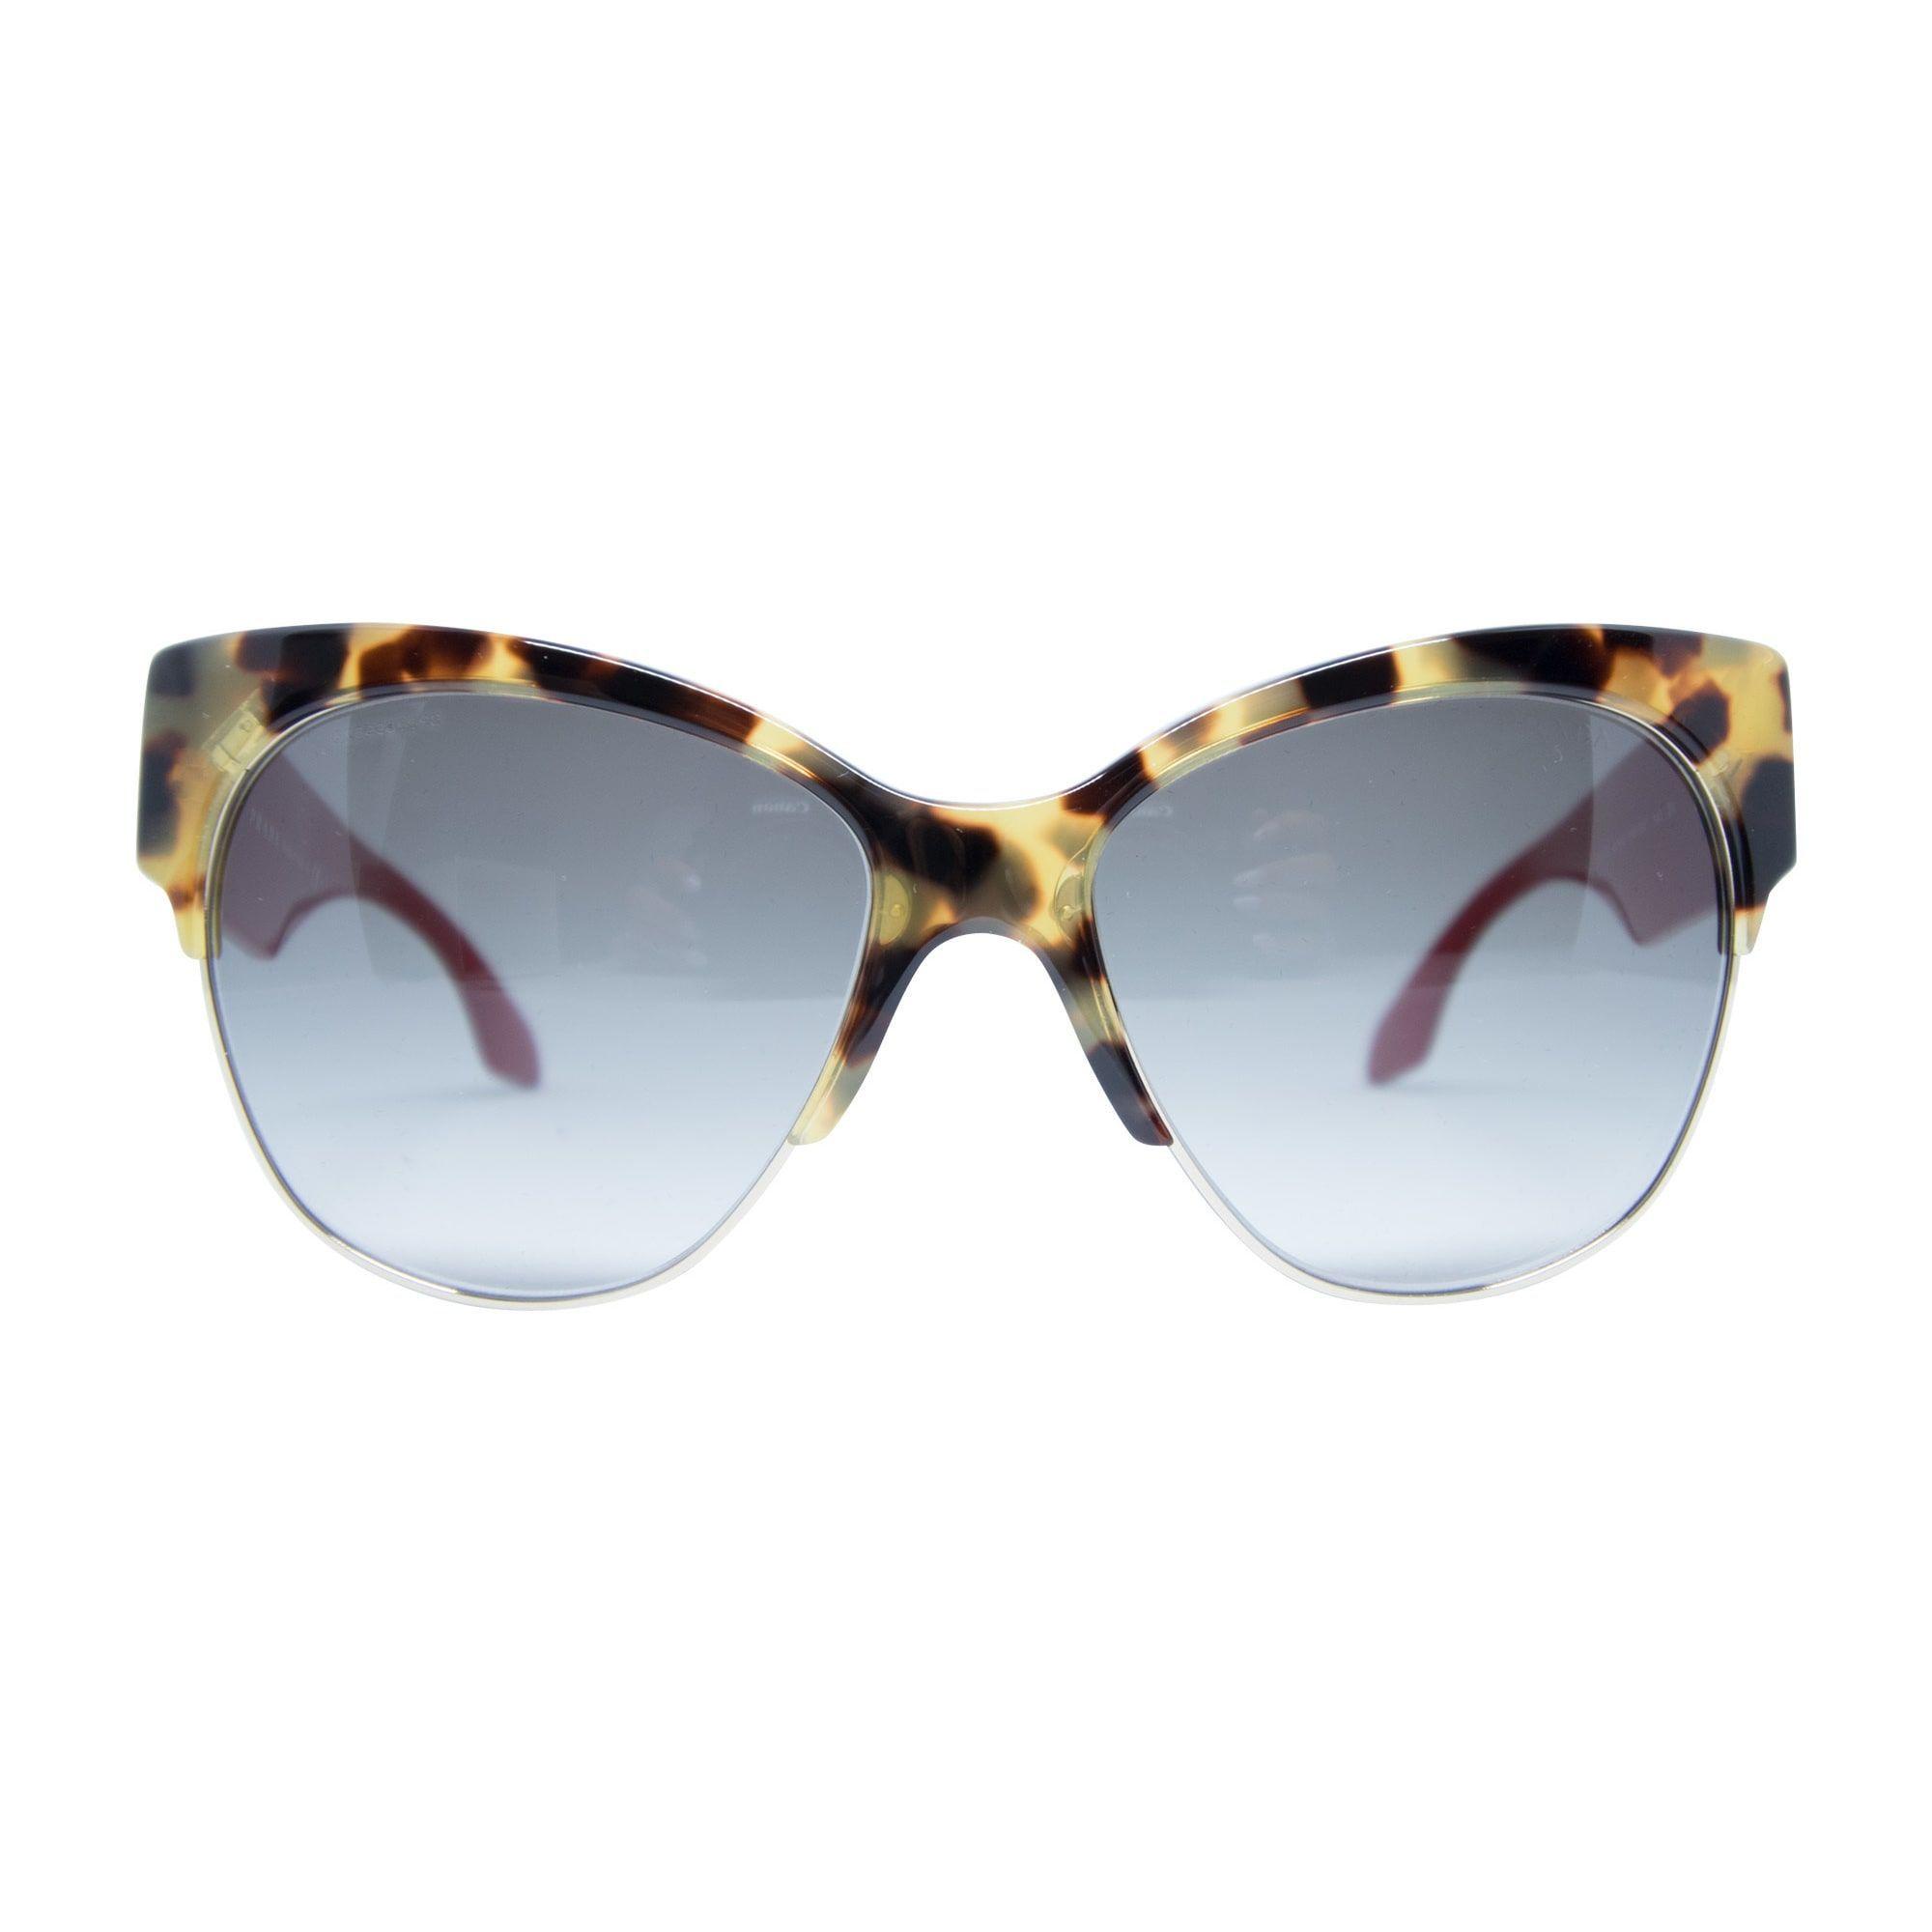 5c48fc8c7ae4 Prada SPR 11R 7SO-0A7 Women's Medium Havana Frame Grey Lens Sunglasses